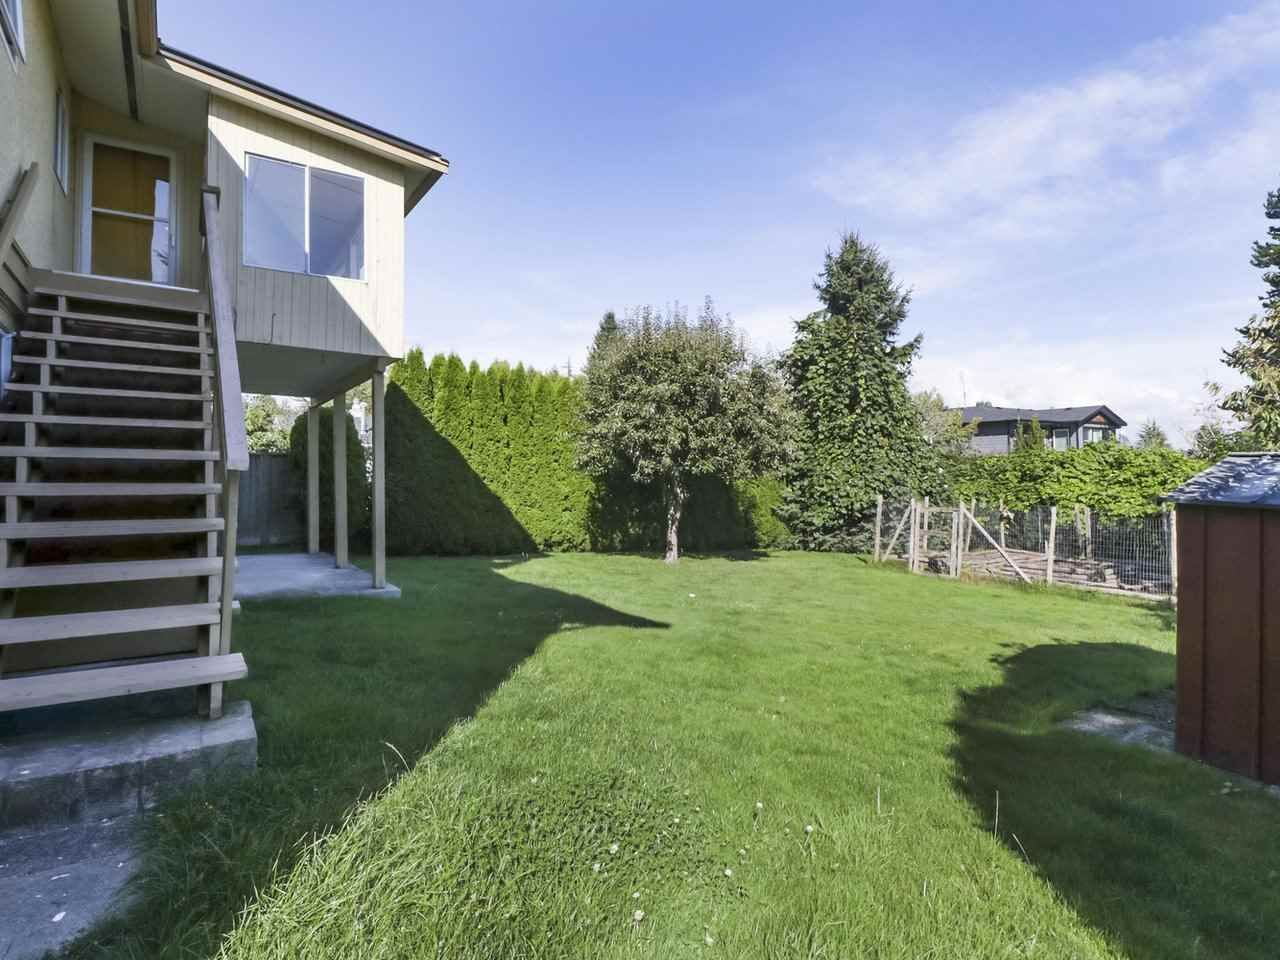 Photo 18: Photos: 1426 KENT Street: White Rock House for sale (South Surrey White Rock)  : MLS®# R2406738